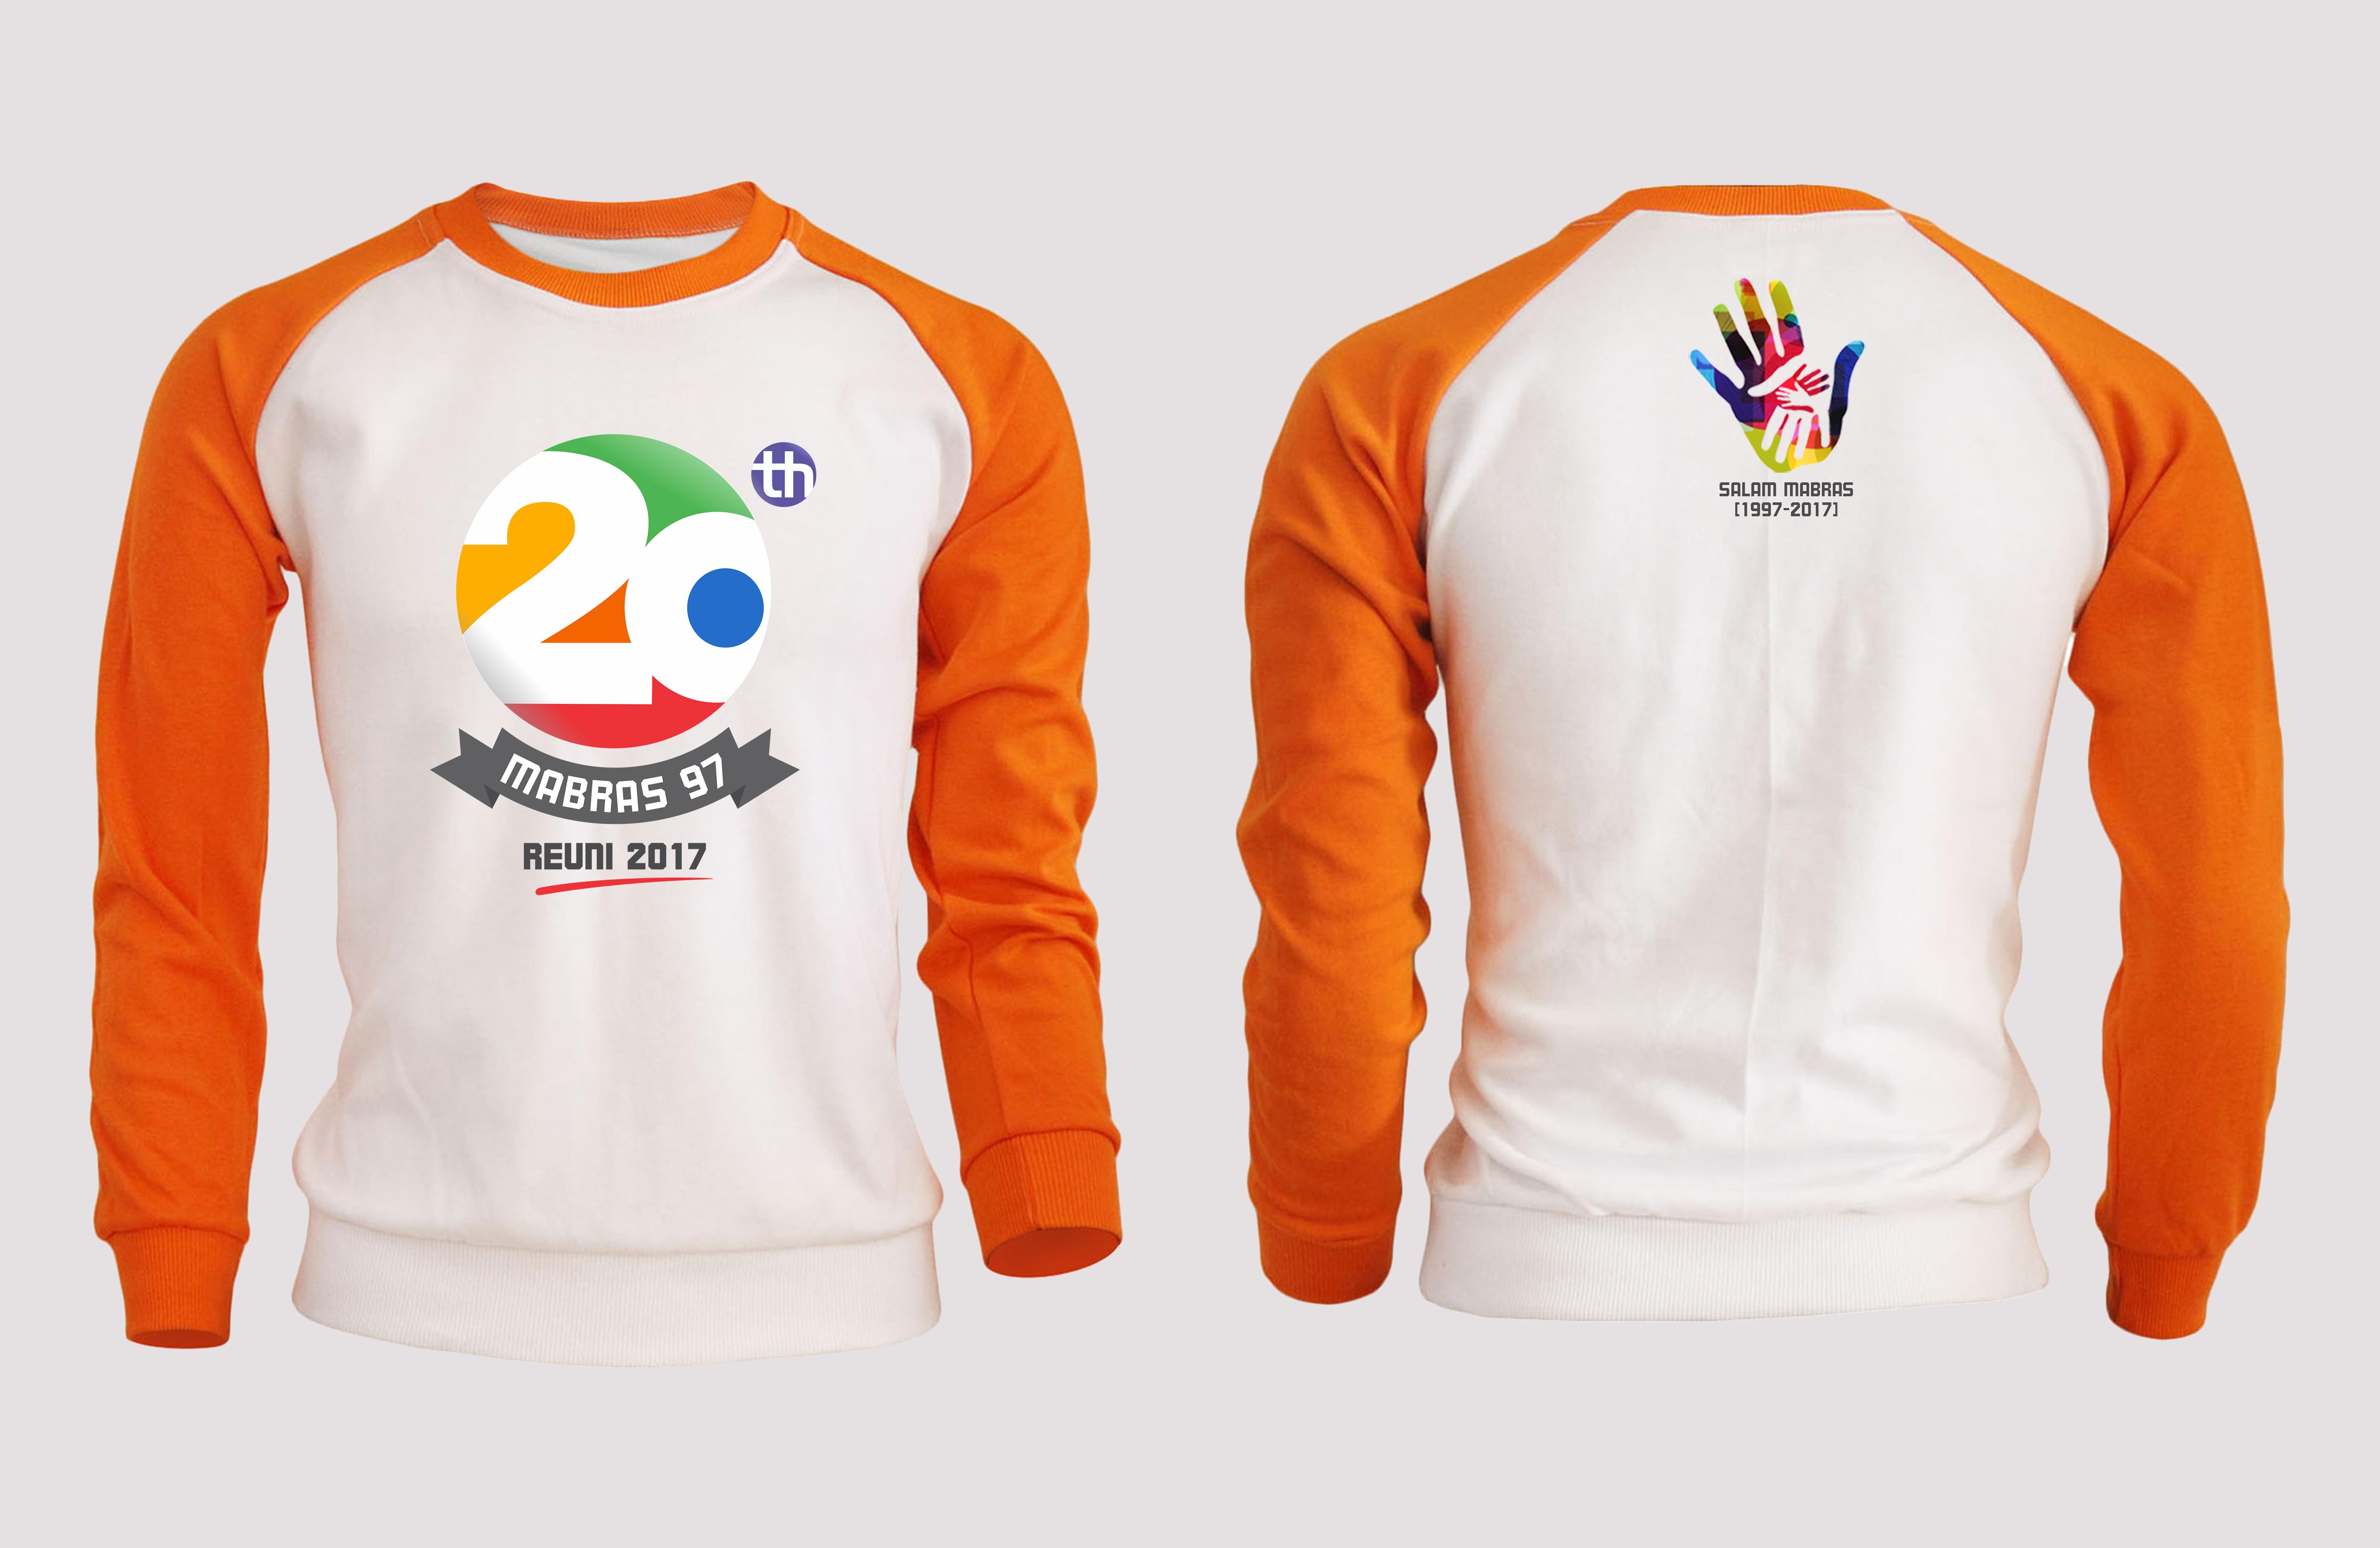 Desain t shirt elegan - 9677bb48f5